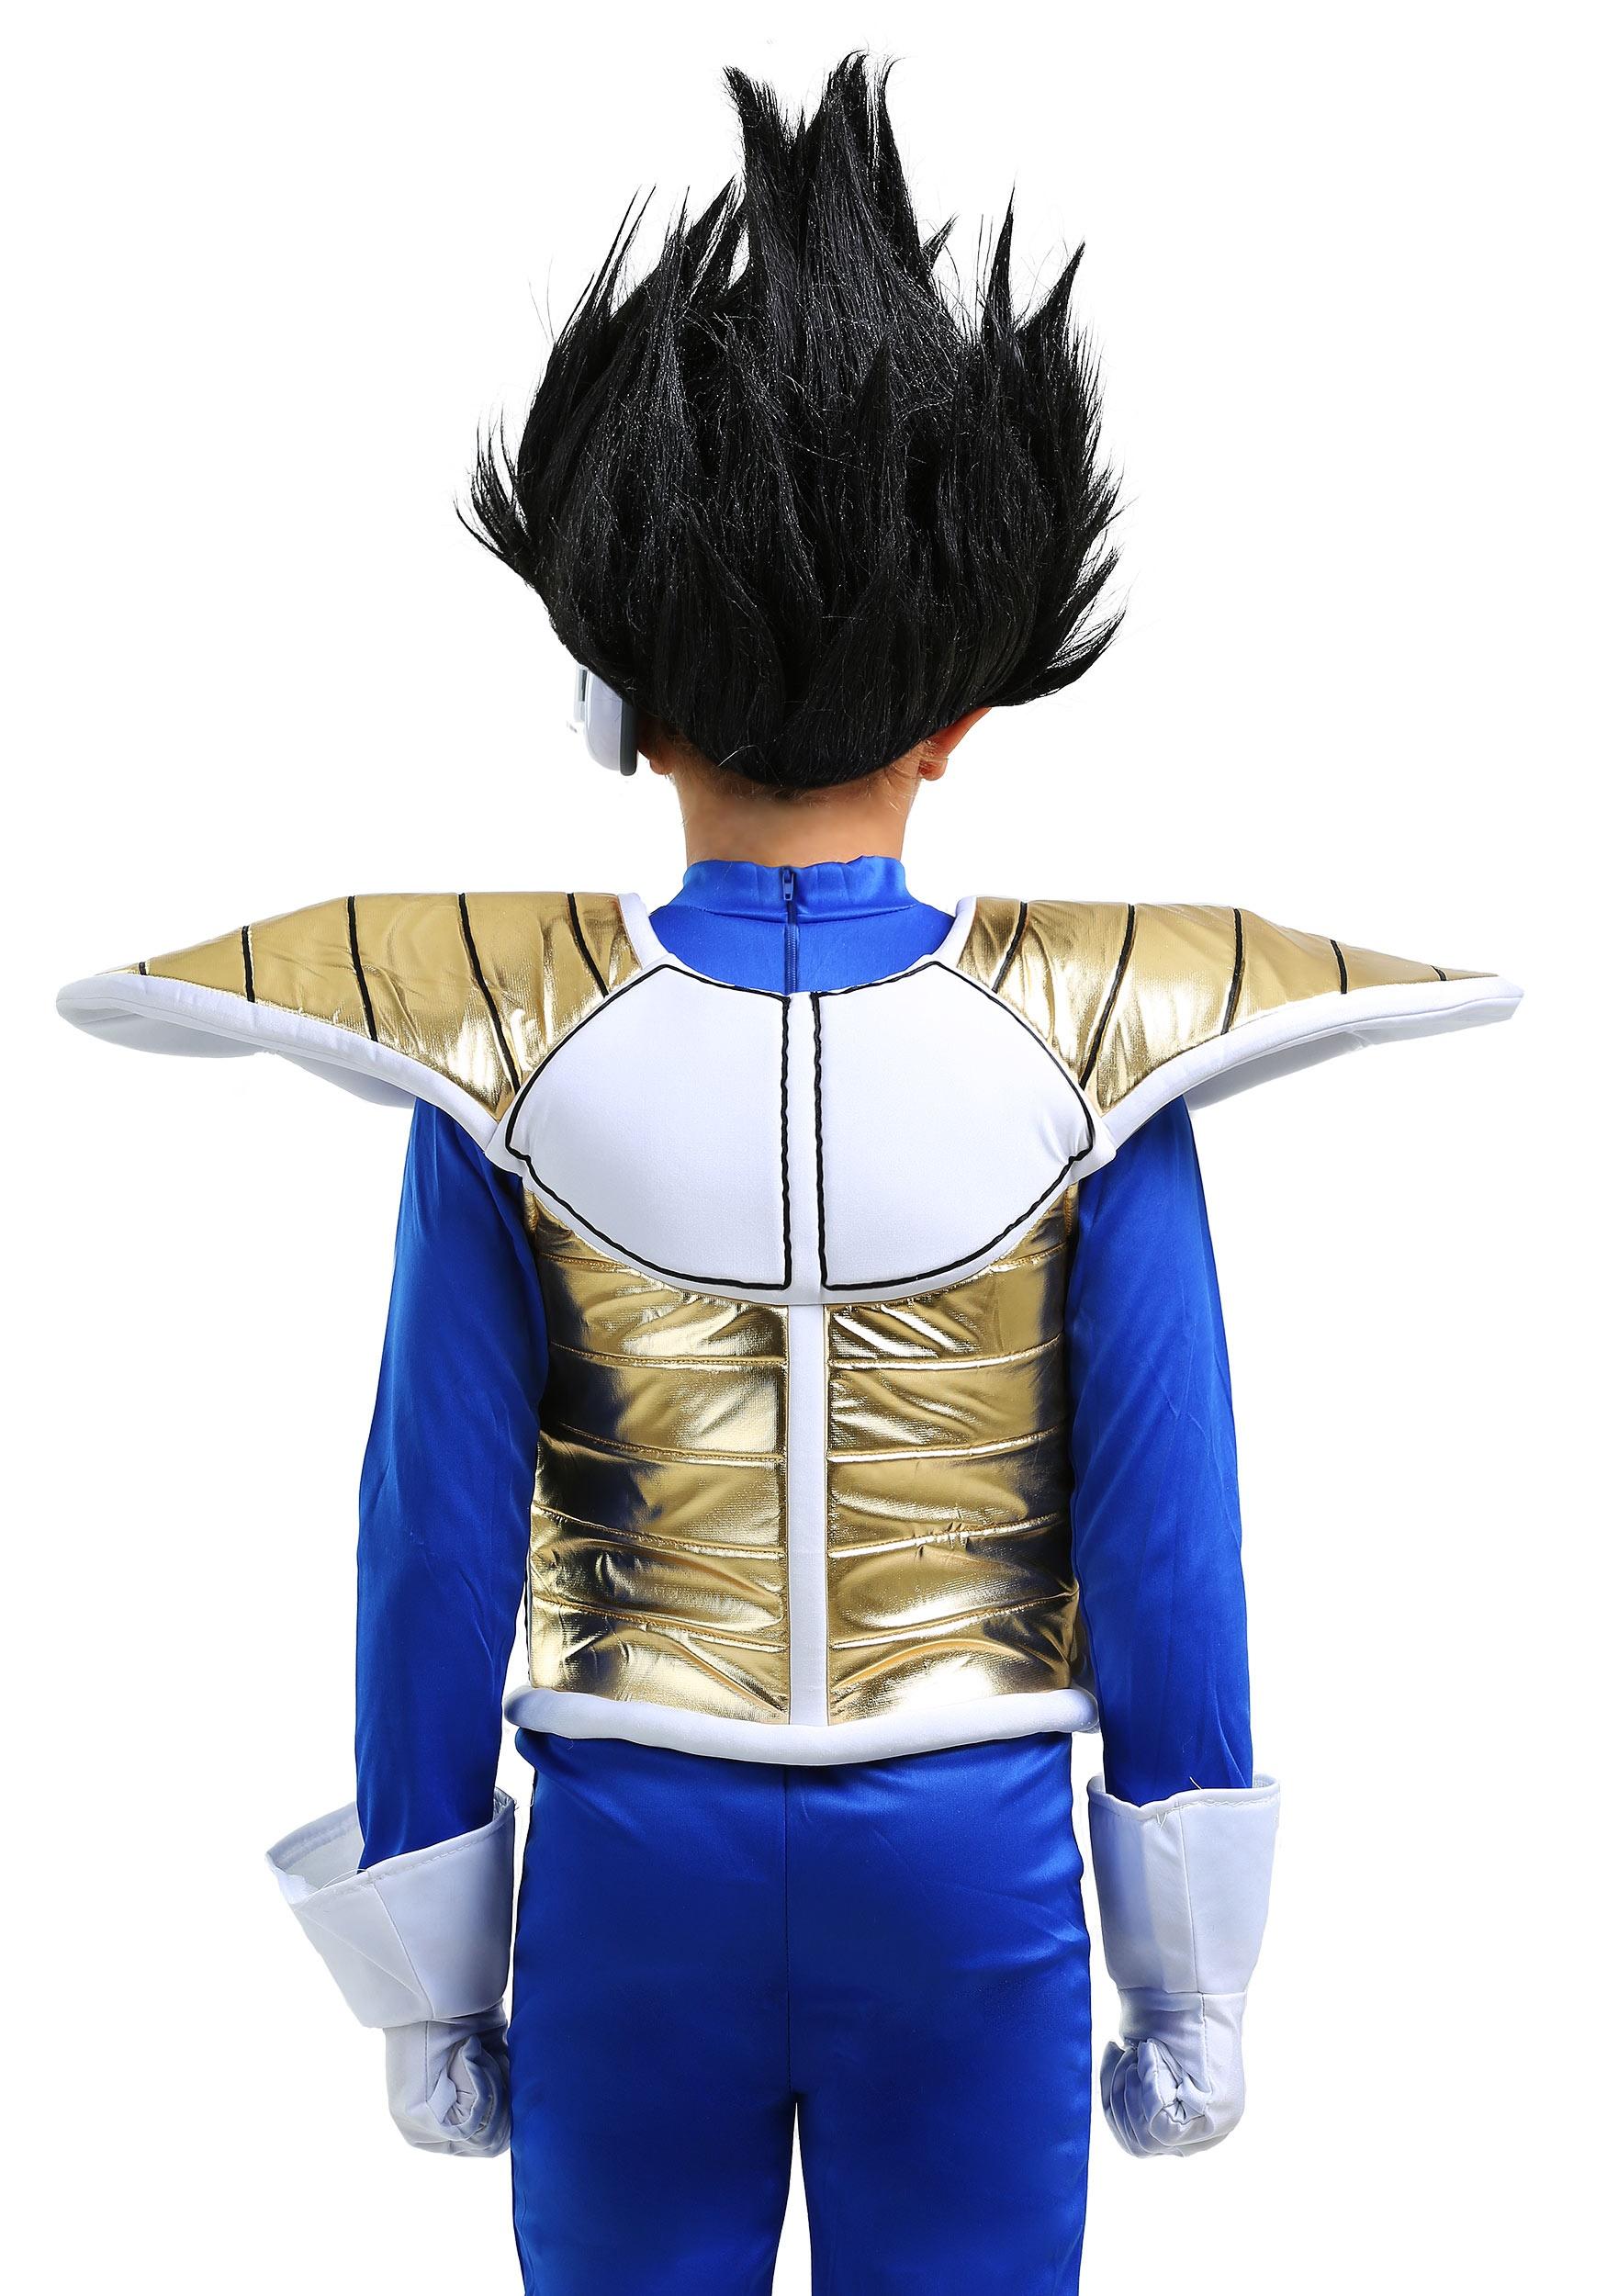 ... Child Dragon Ball Z Saiyan Armor Accessory  sc 1 st  Halloween Costumes & Dragon Ball Z Saiyan Child Armor Accessory